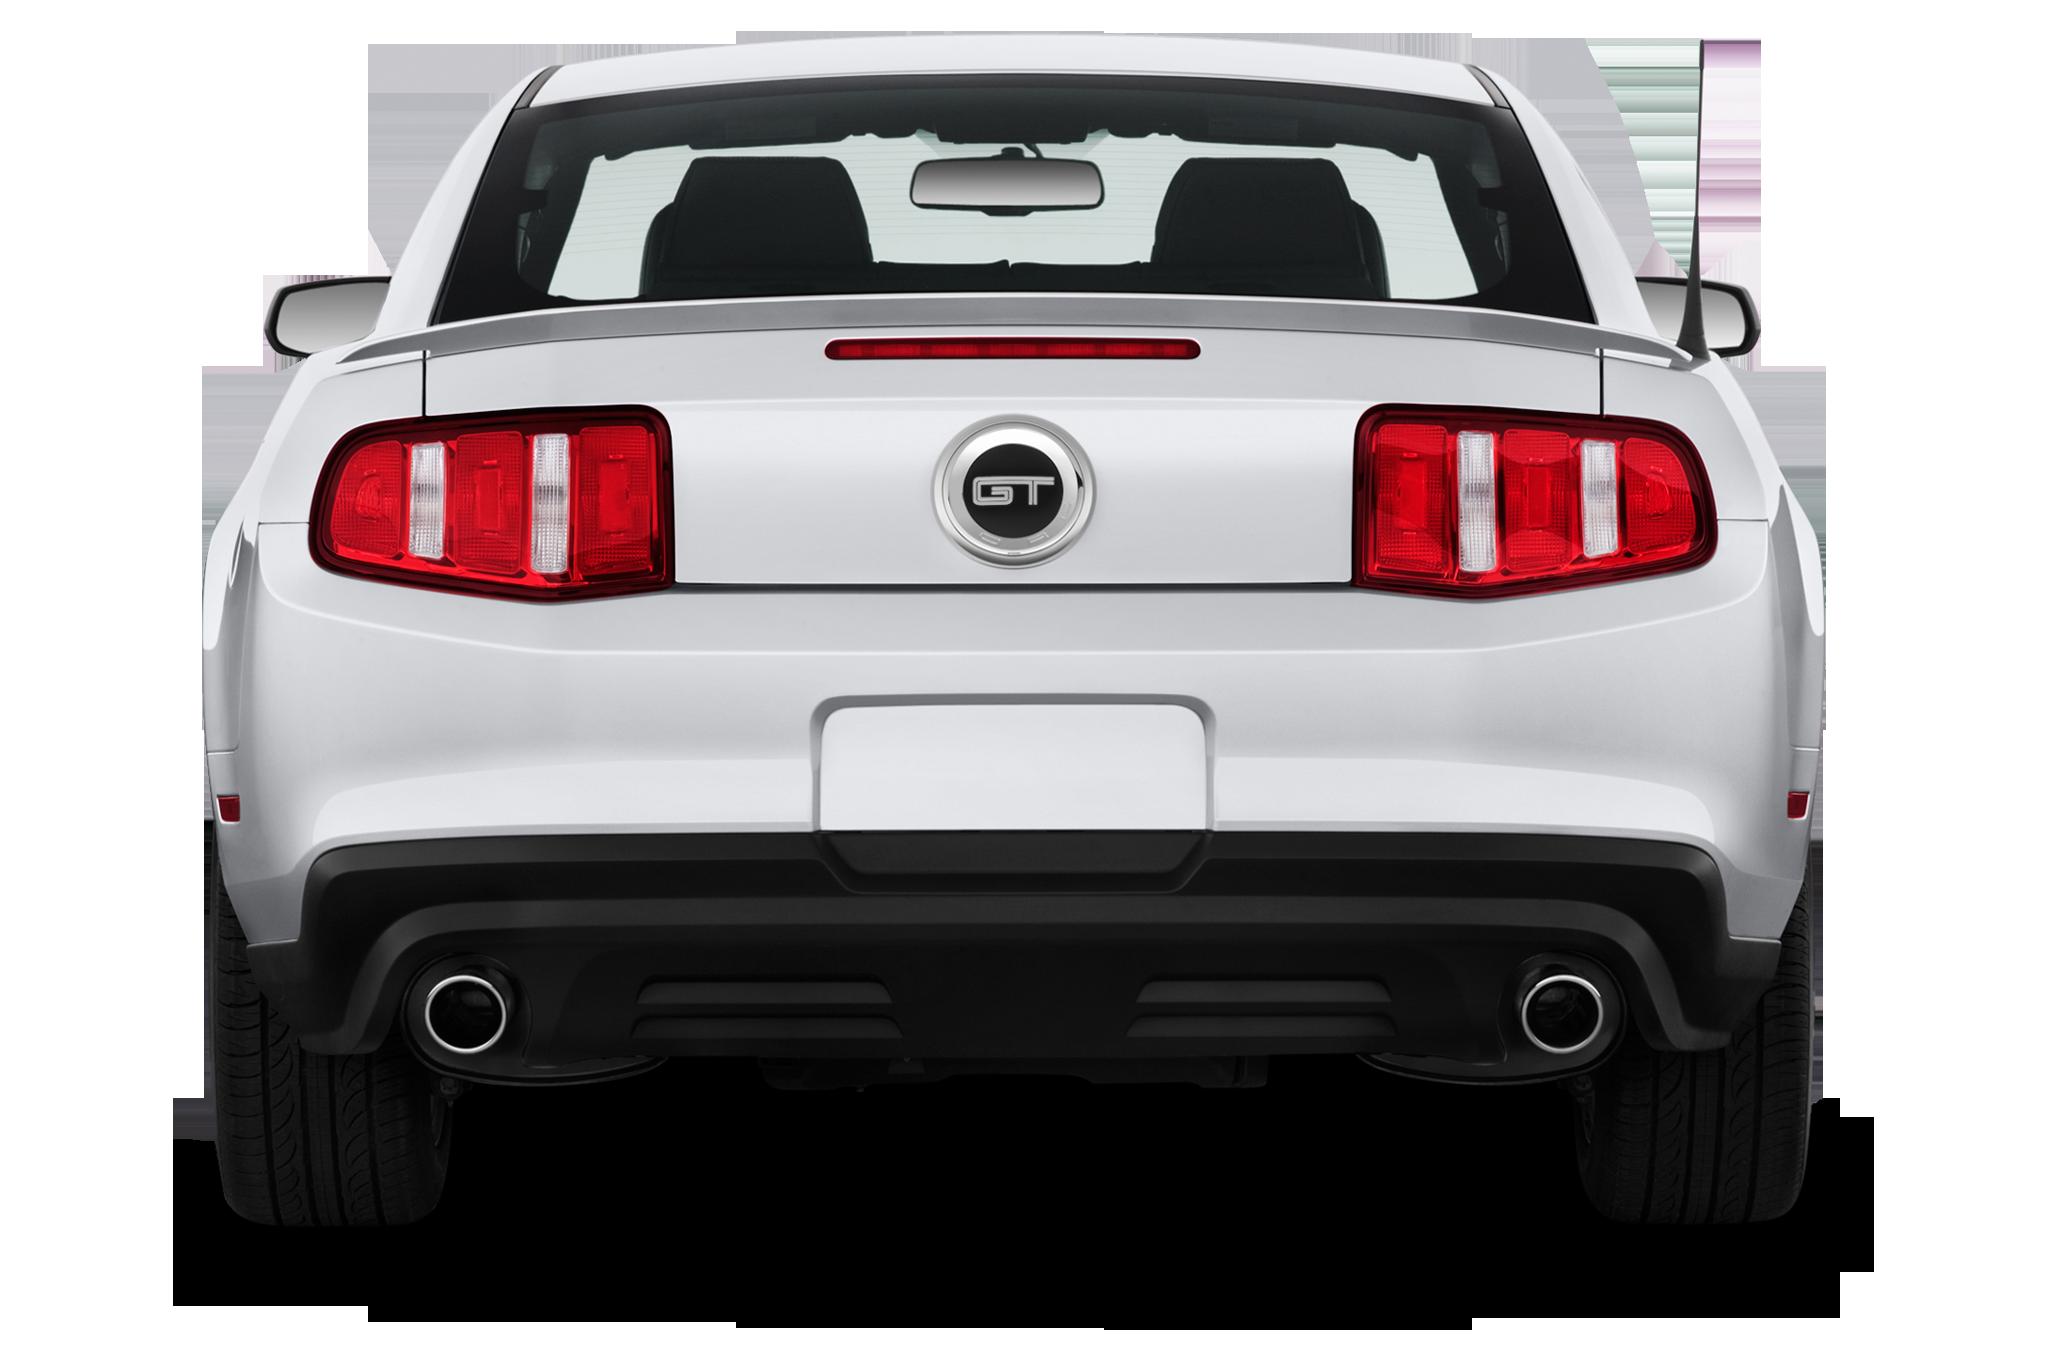 2012 Shelby Mustang GT500 Super Snake